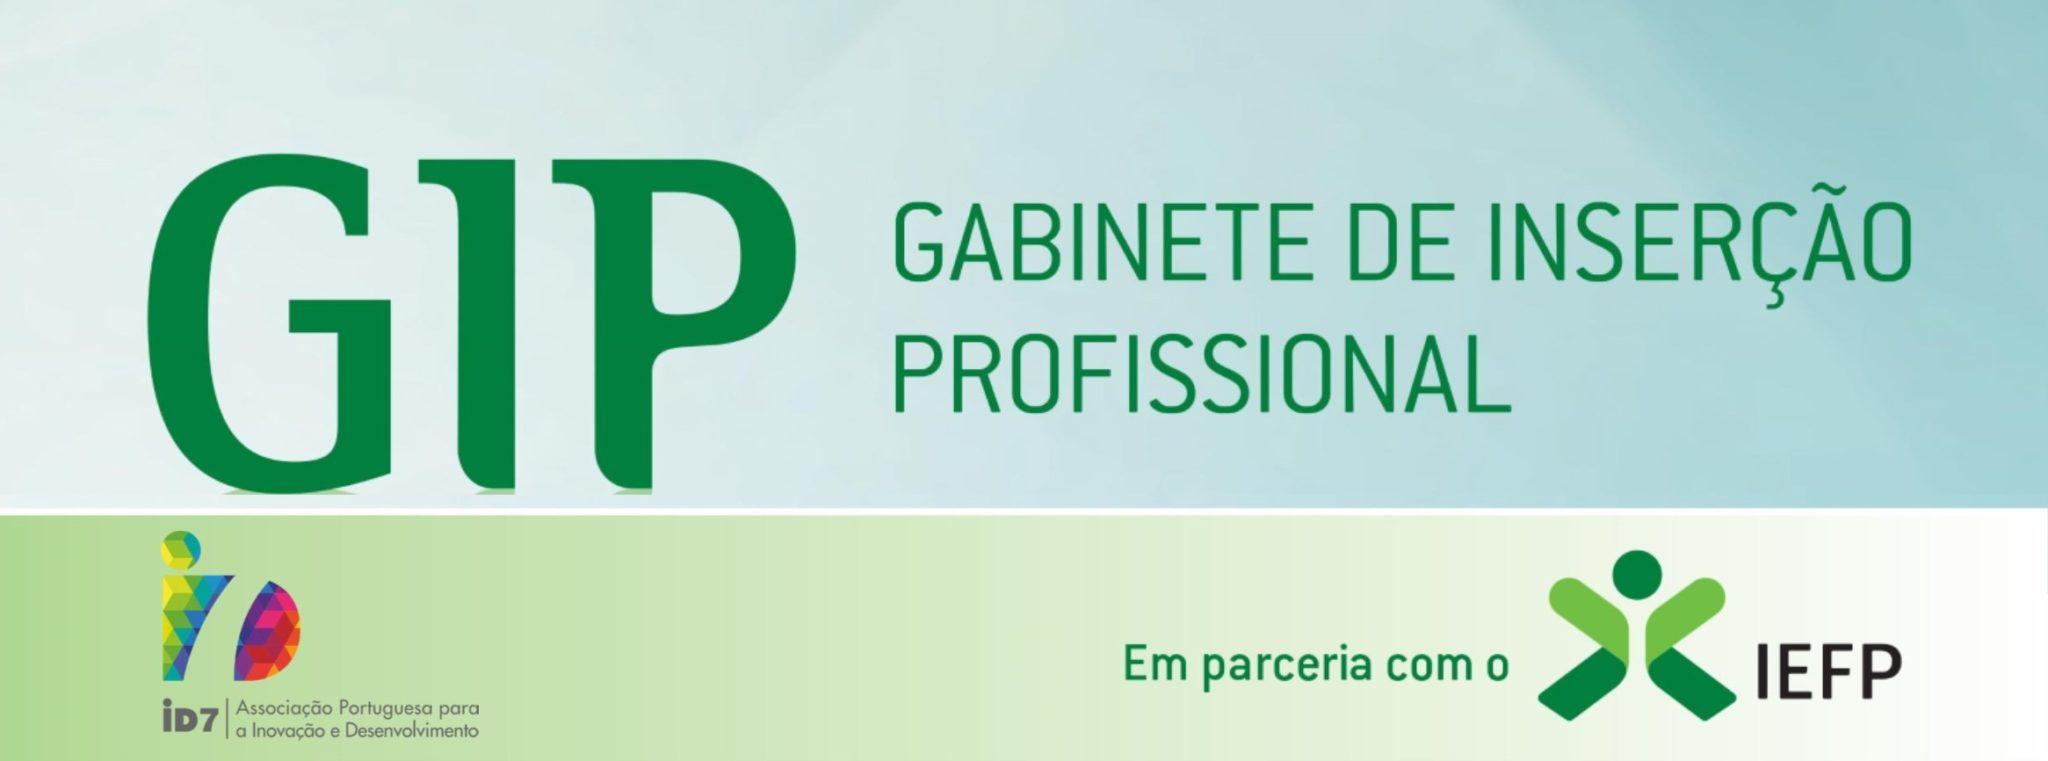 Gabinete de Inserção Profissional - Setúbal